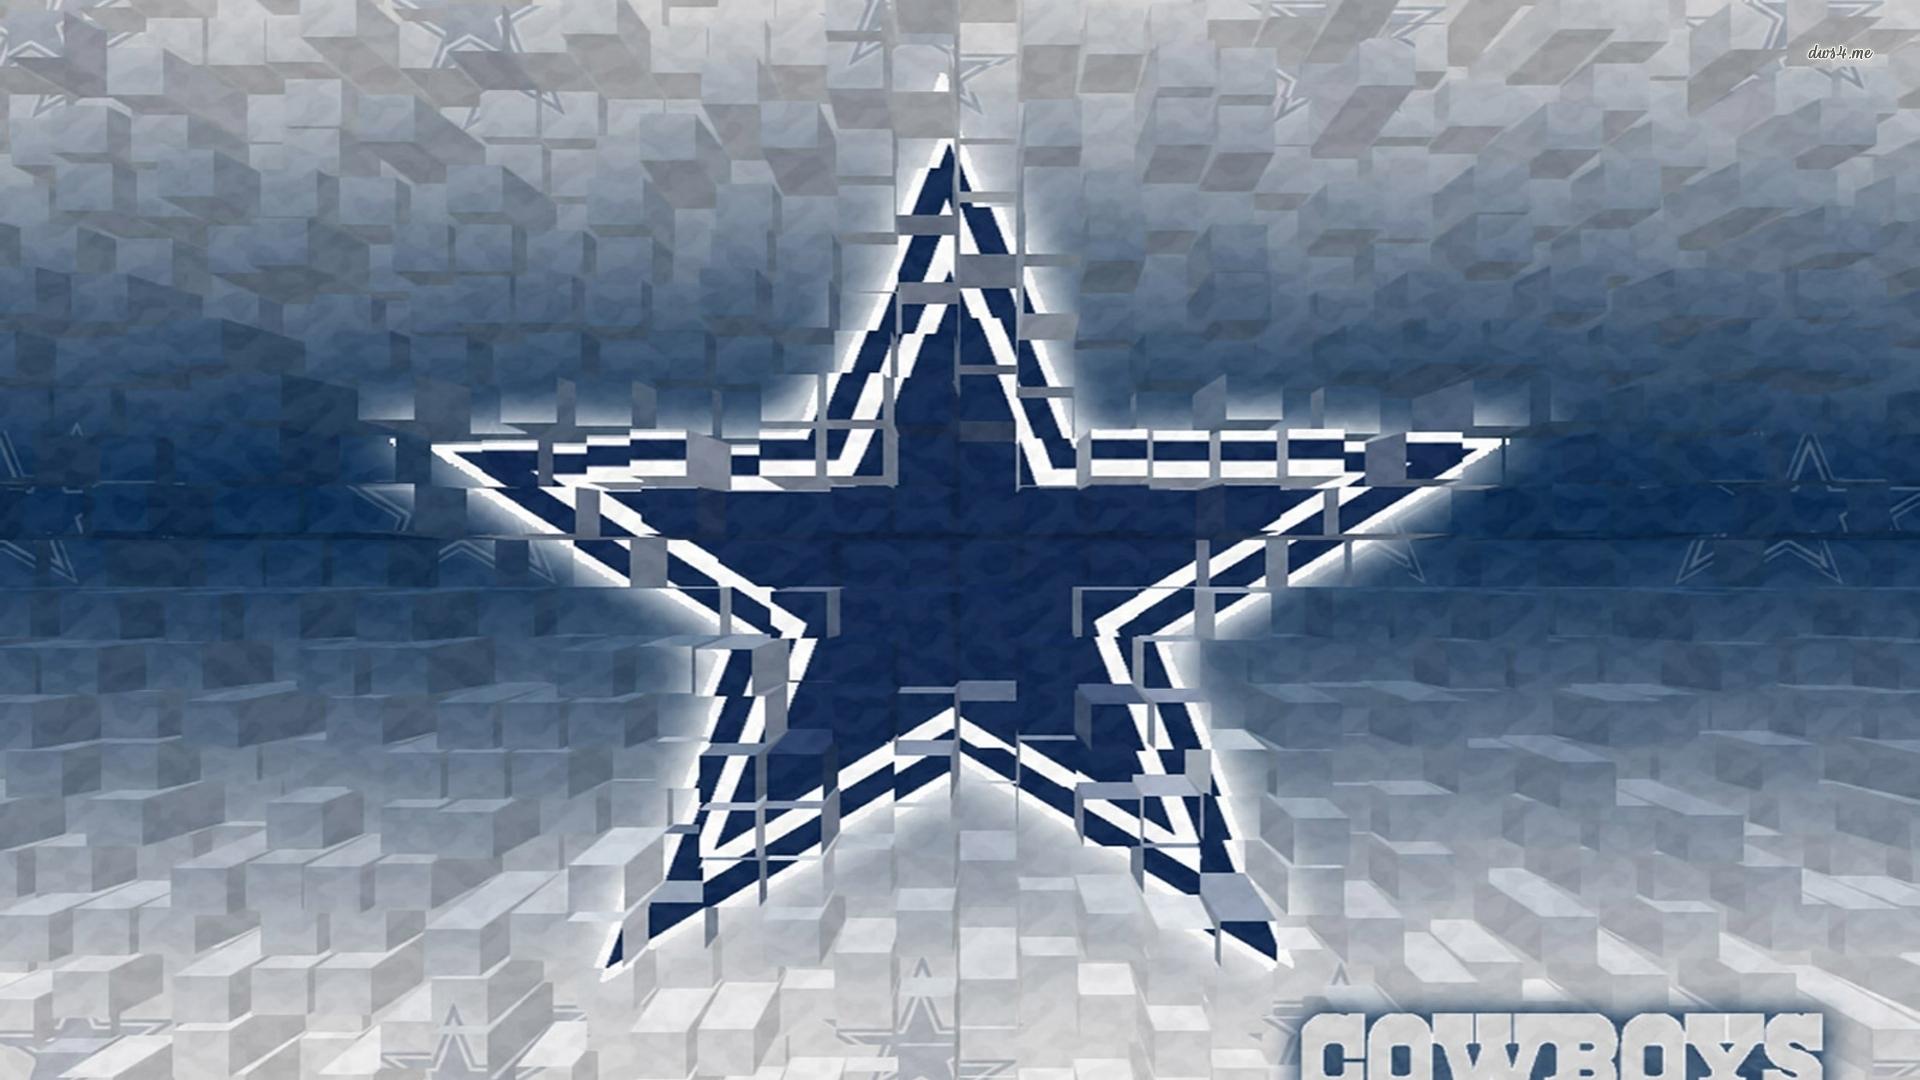 Dallas Cowboys logo wallpaper   Sport wallpapers   22355 1920x1080